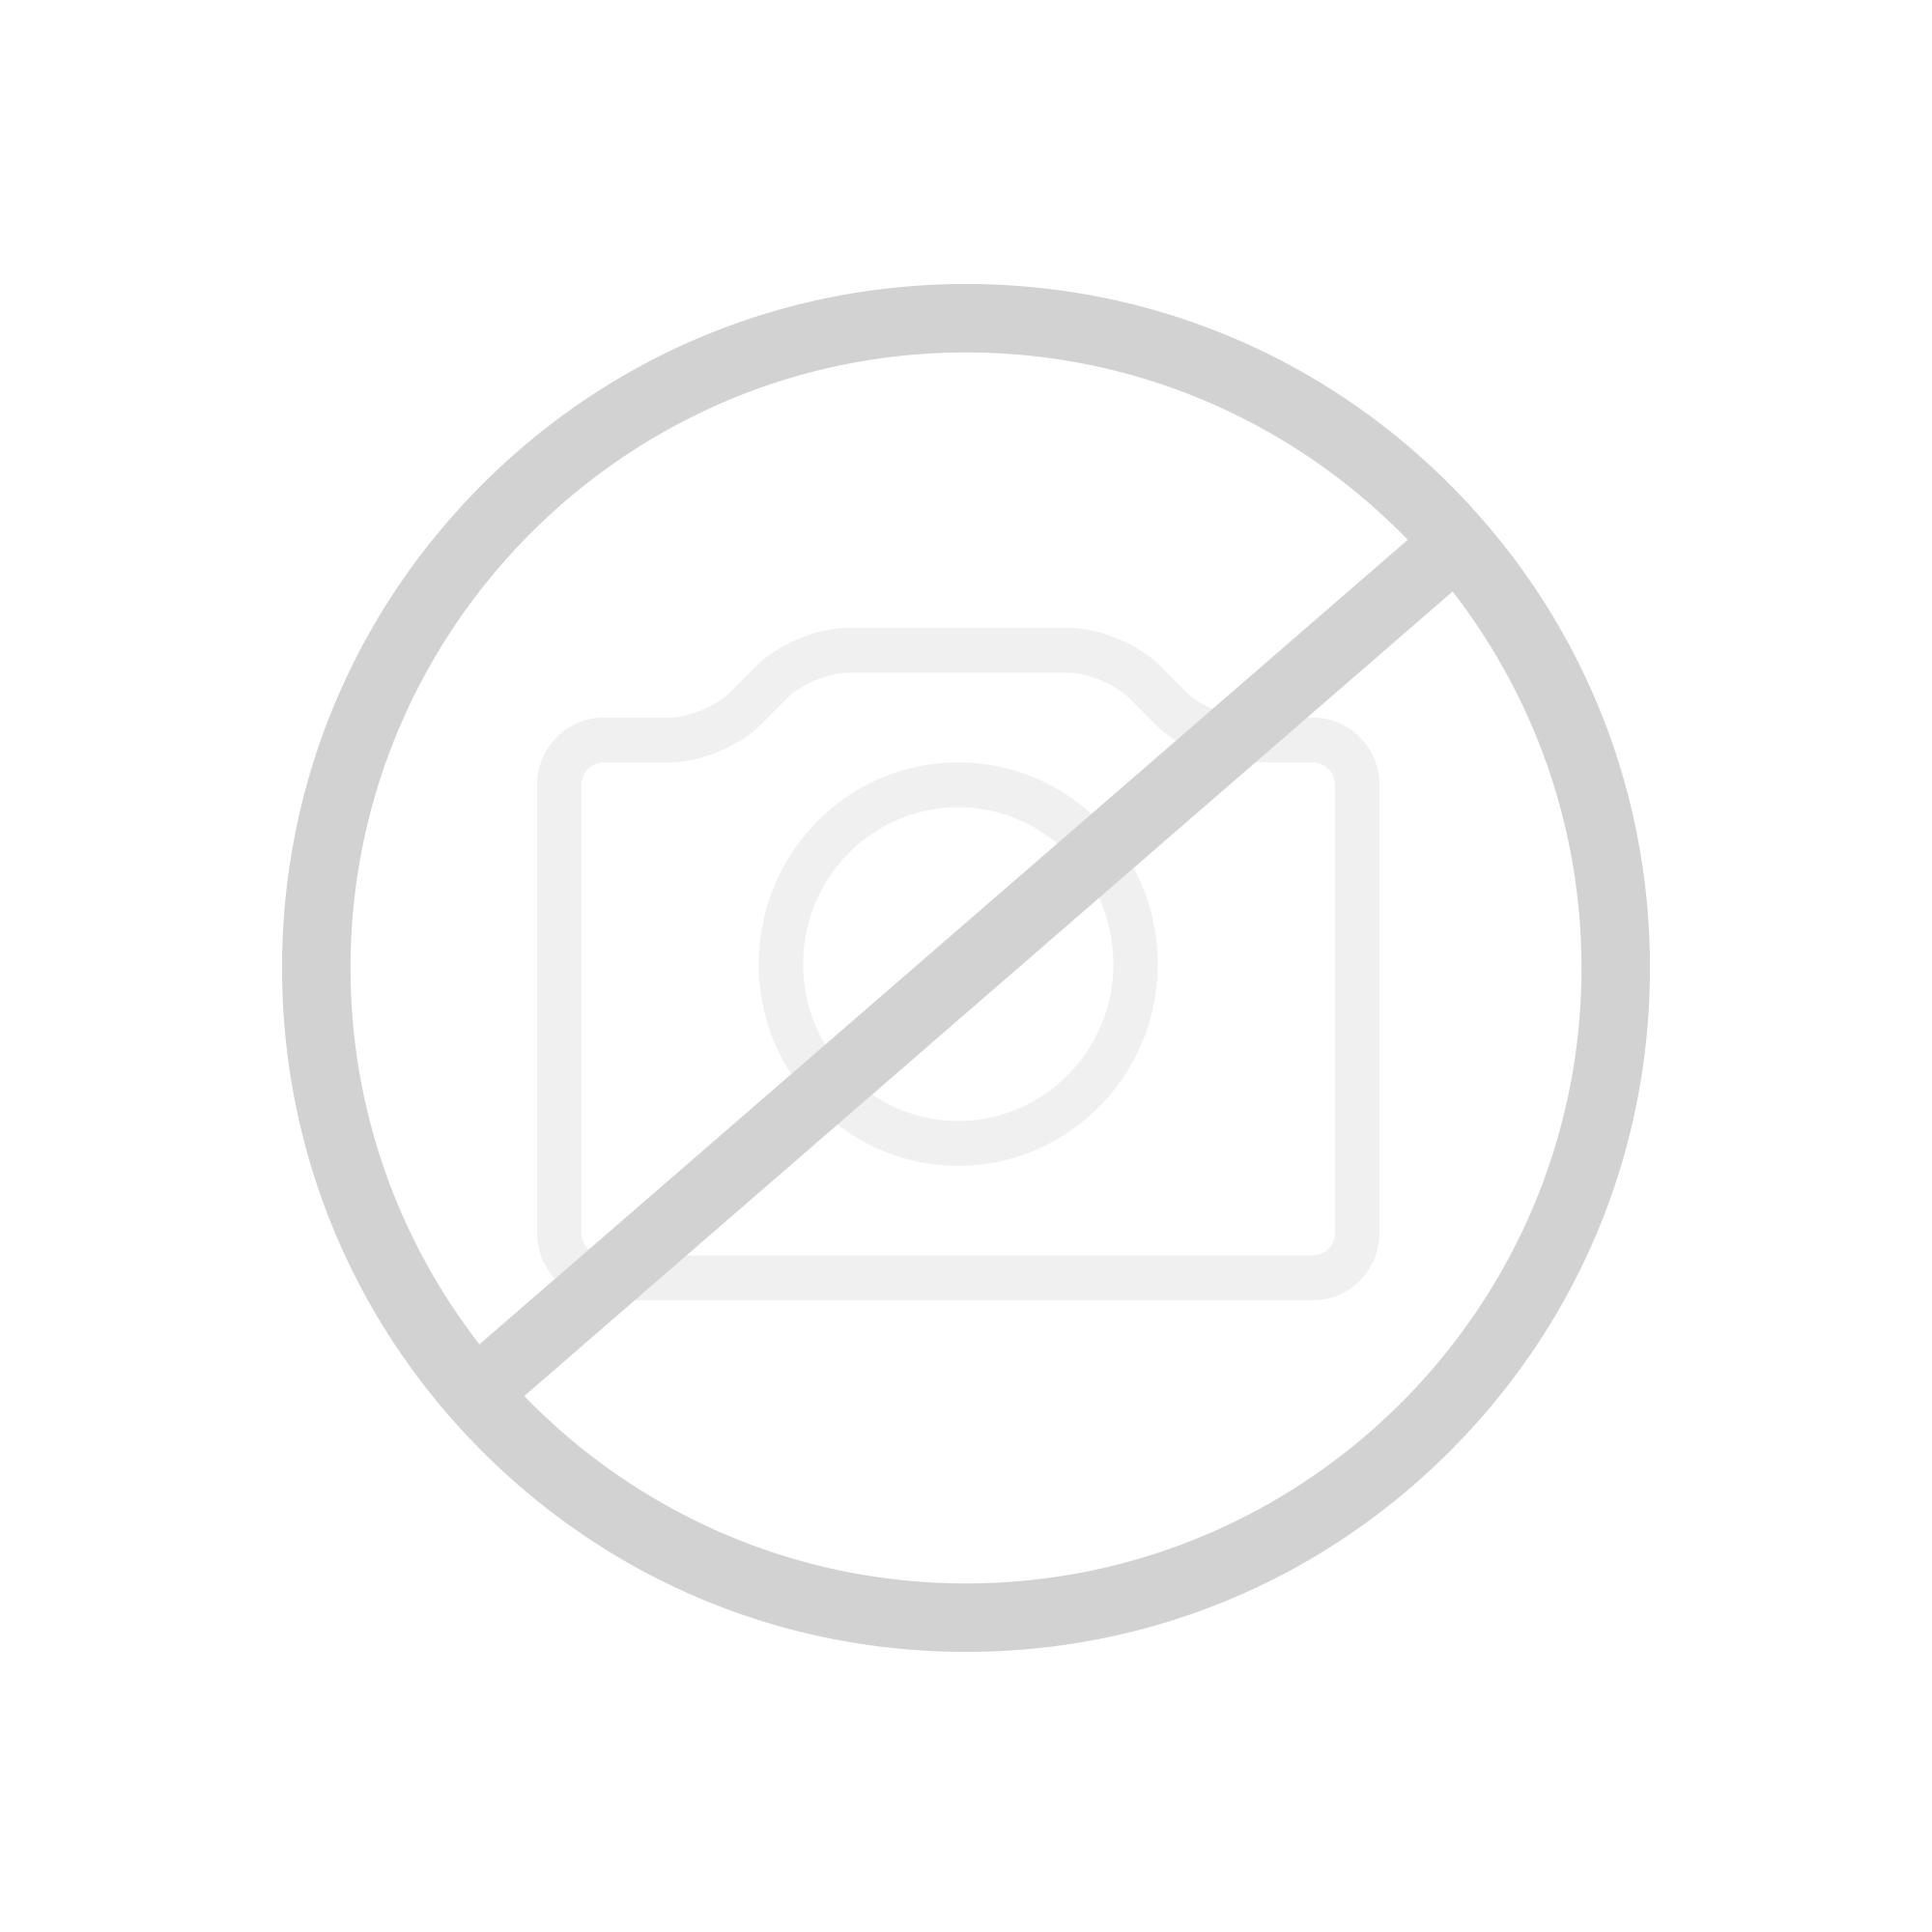 Flos CLESSIDRA LED Wandleuchte